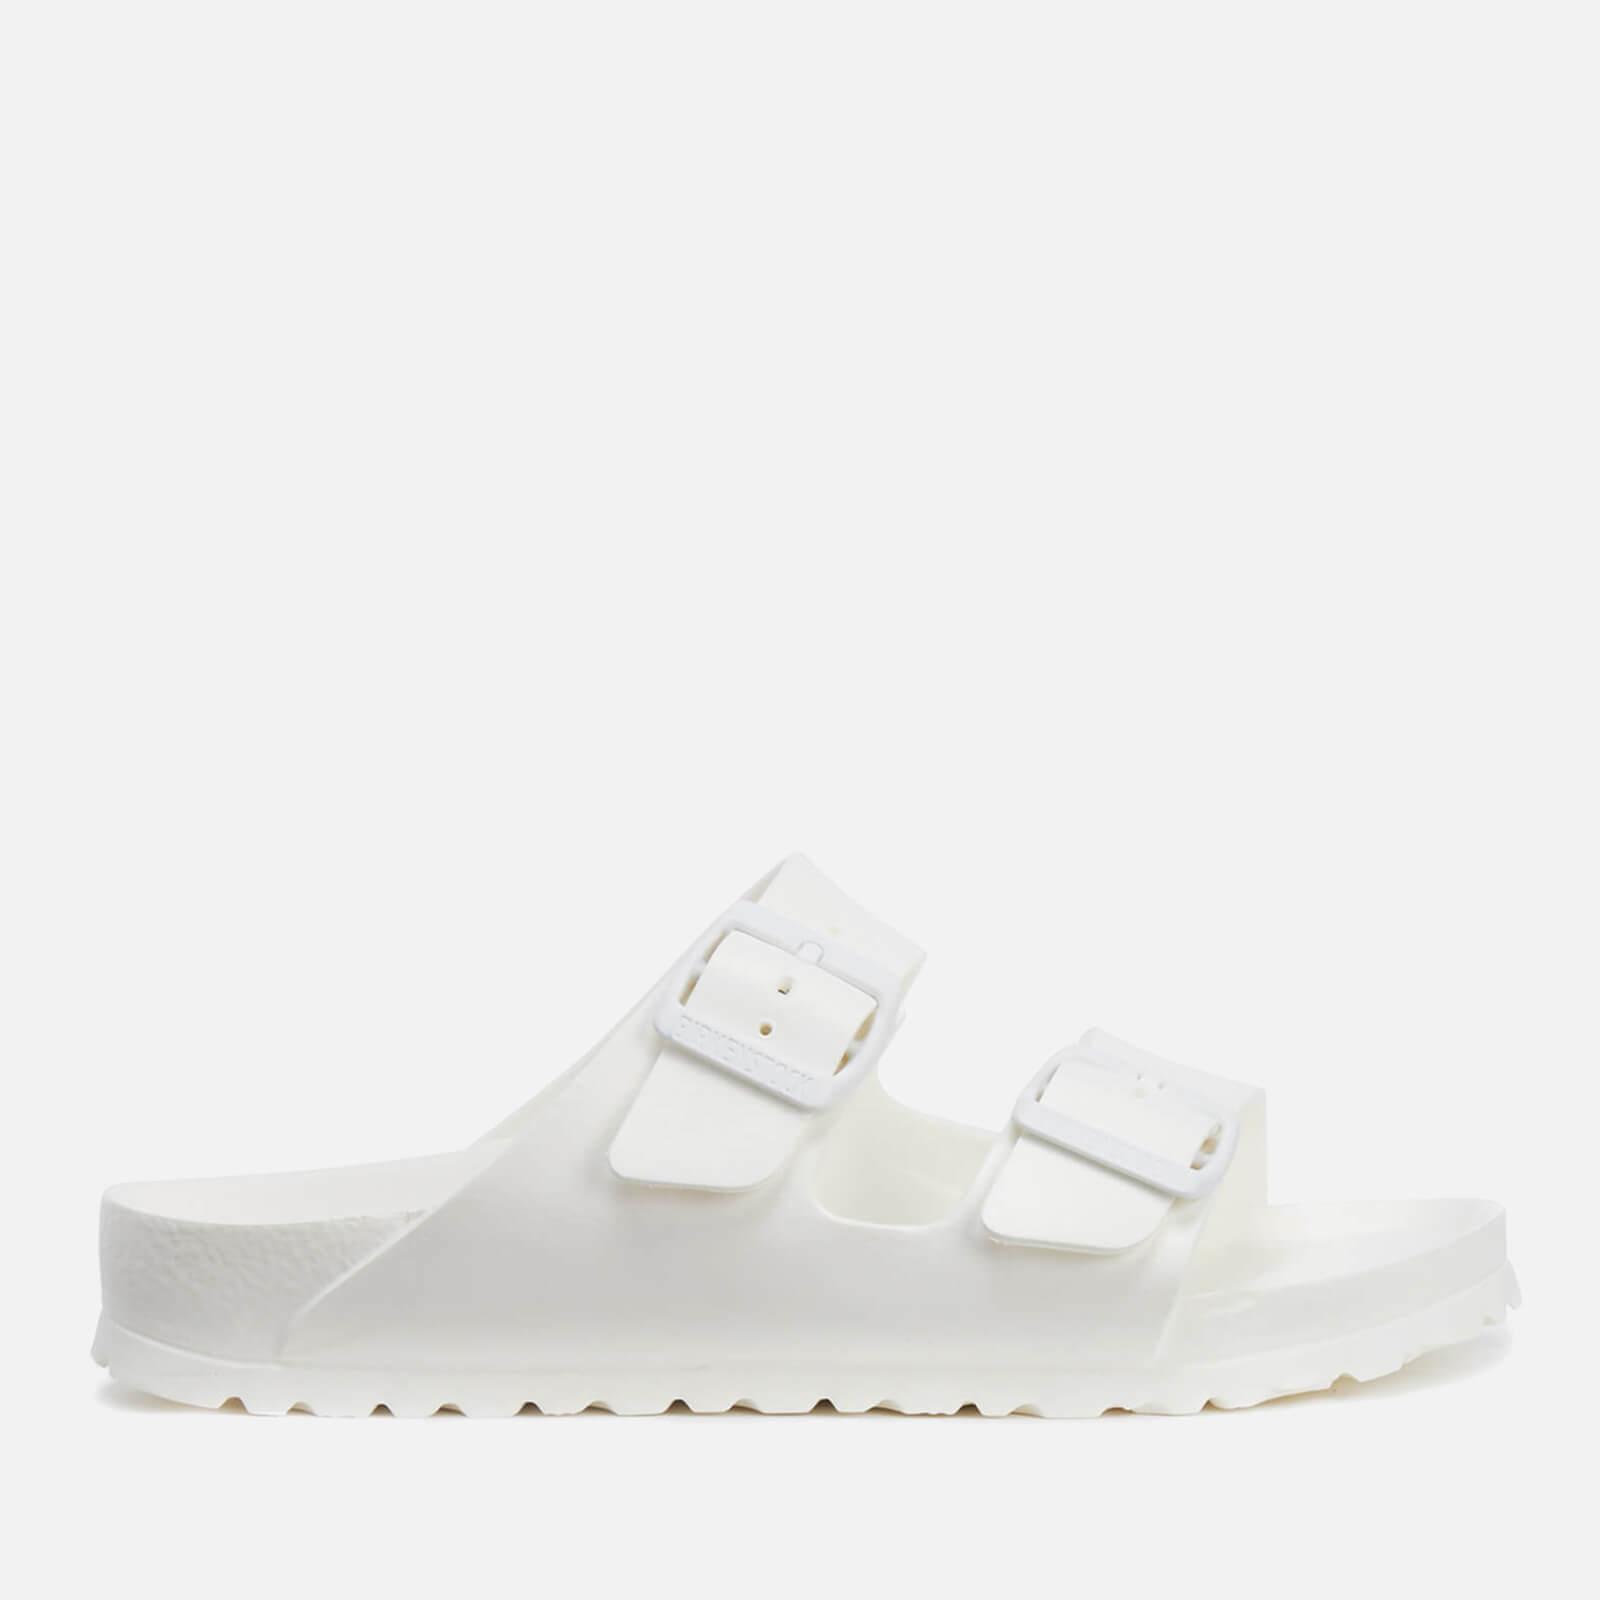 995c467b846 Birkenstock Women s Arizona EVA Double Strap Sandals - White - Free UK  Delivery over £50